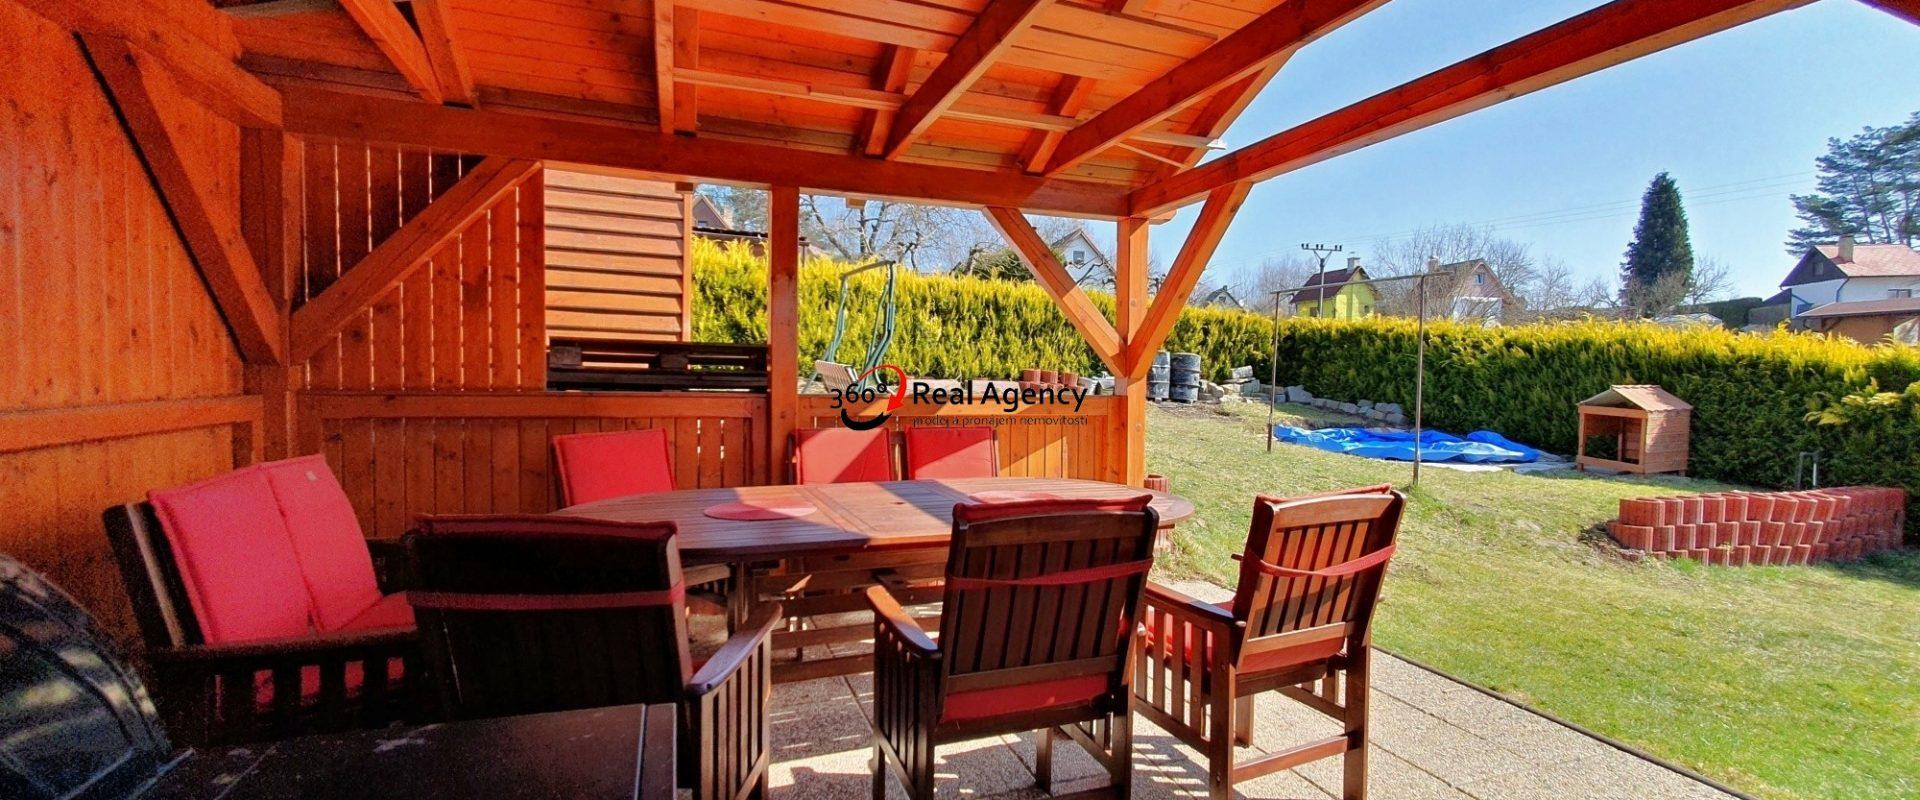 Prodej chaty 36 m², pozemek 326 m², Dražice, okres Tábor.